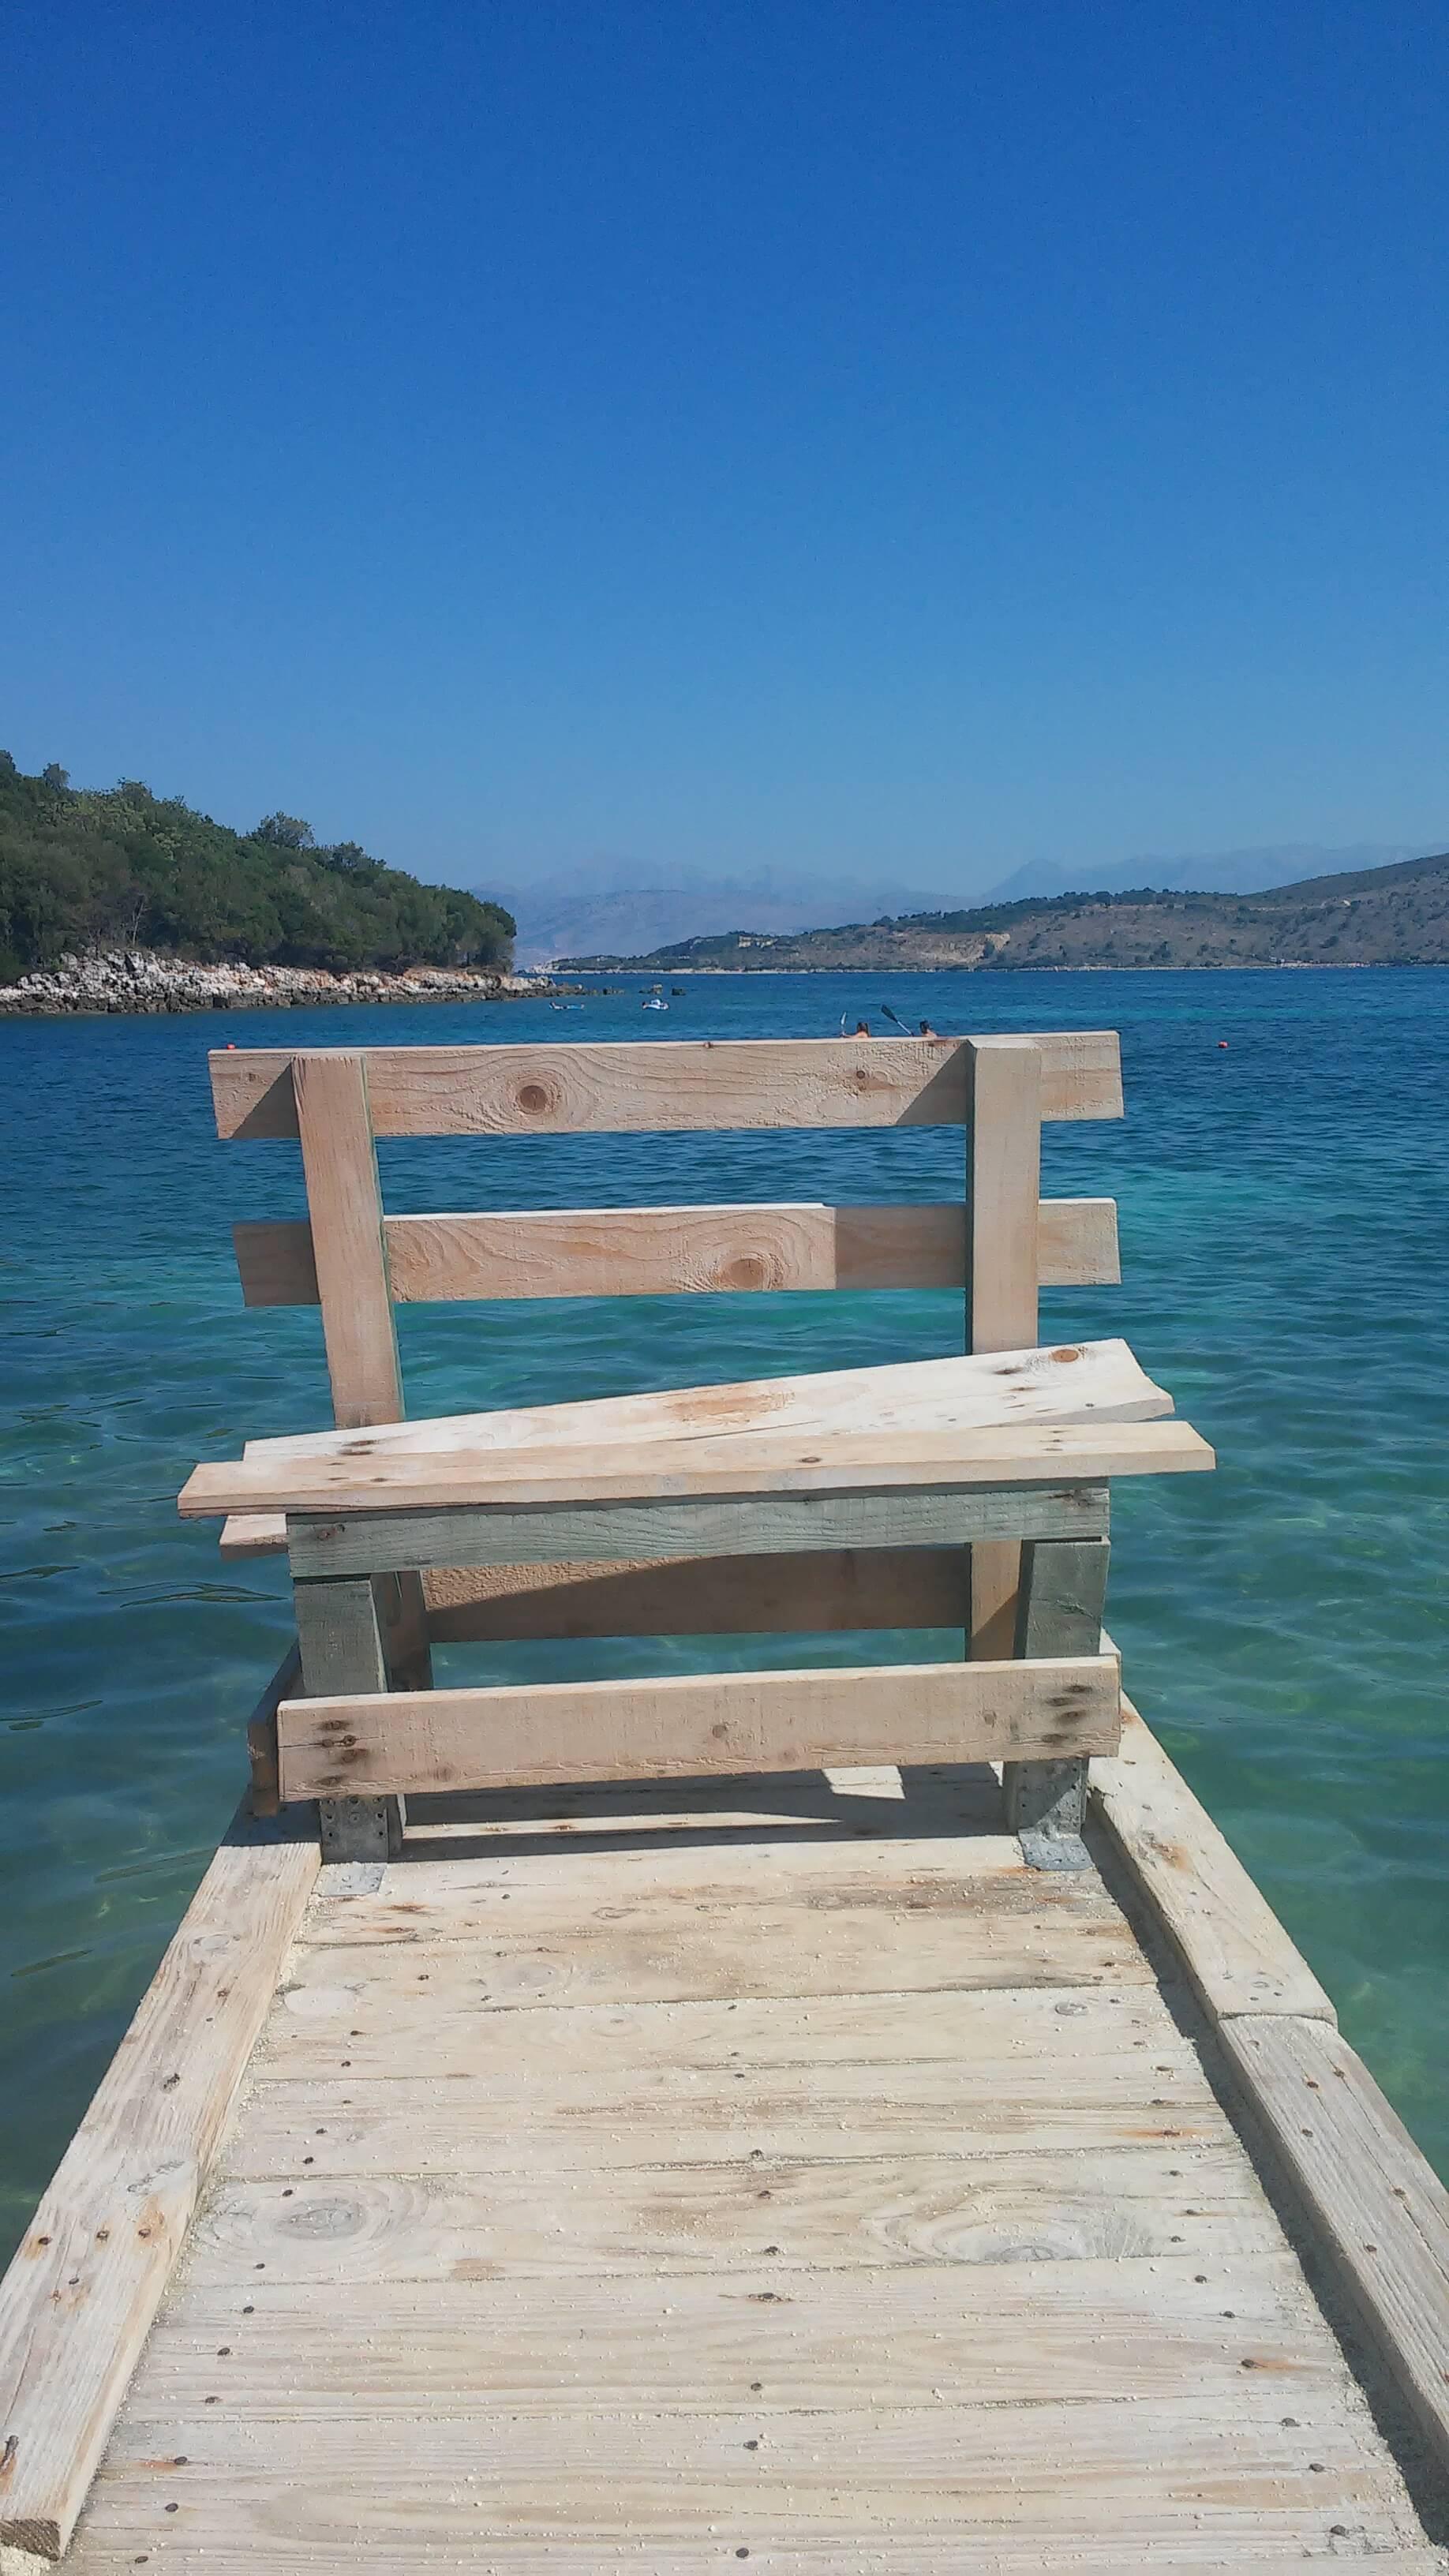 Spiaggia Ksamil, Albania